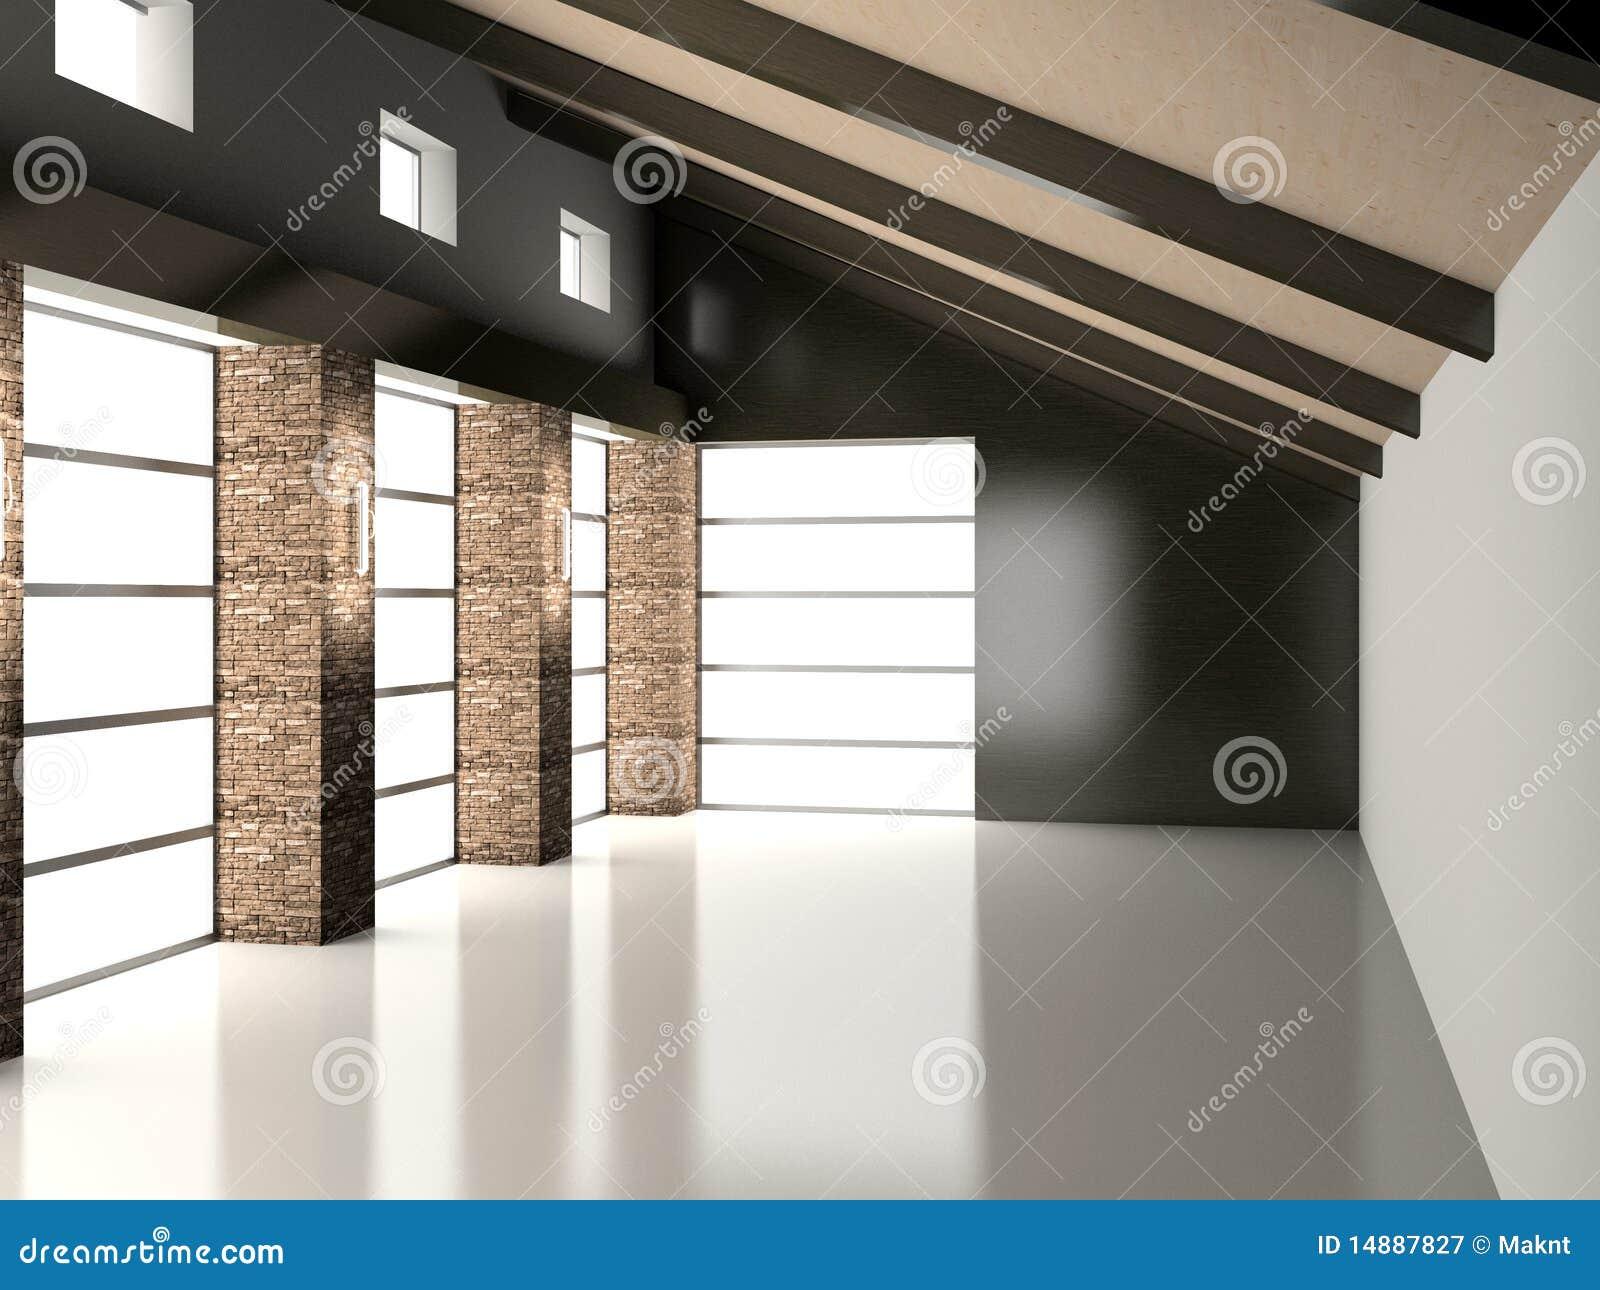 empty interior royalty free stock photography - image: 14887827